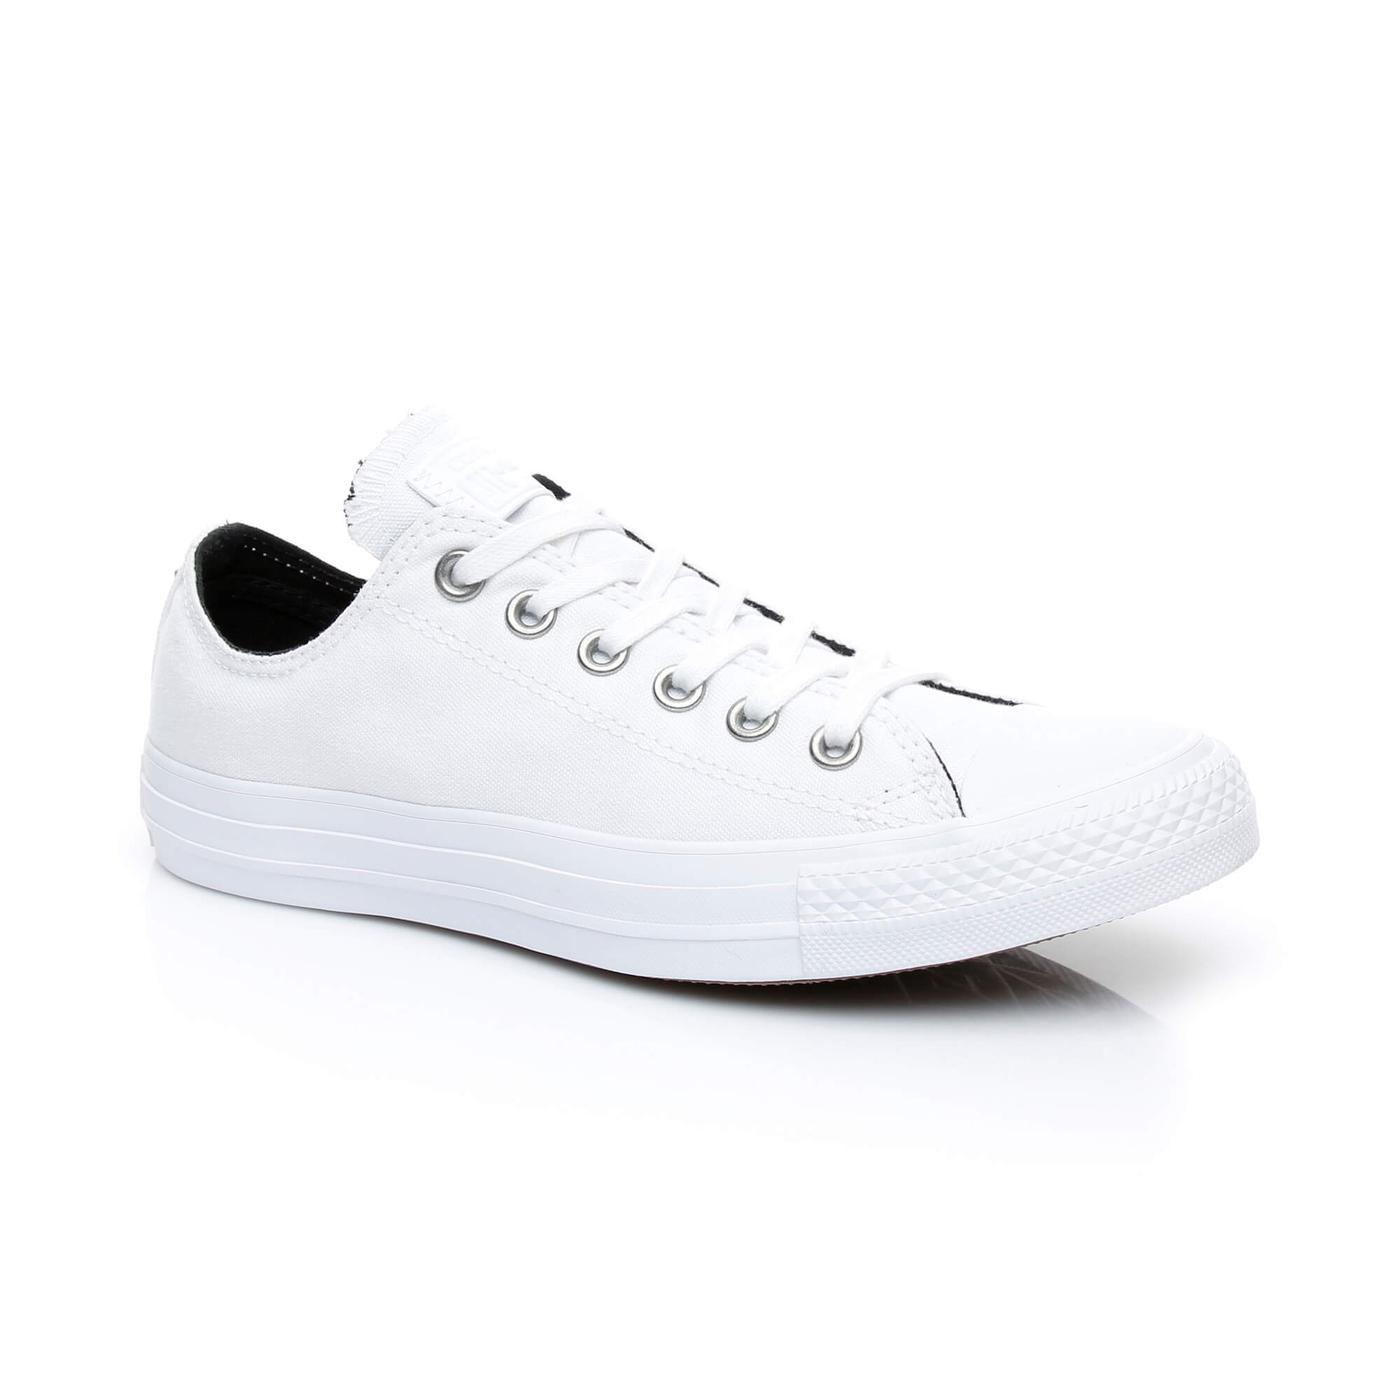 Converse Chuck Taylor All Star Kadın Beyaz Sneaker